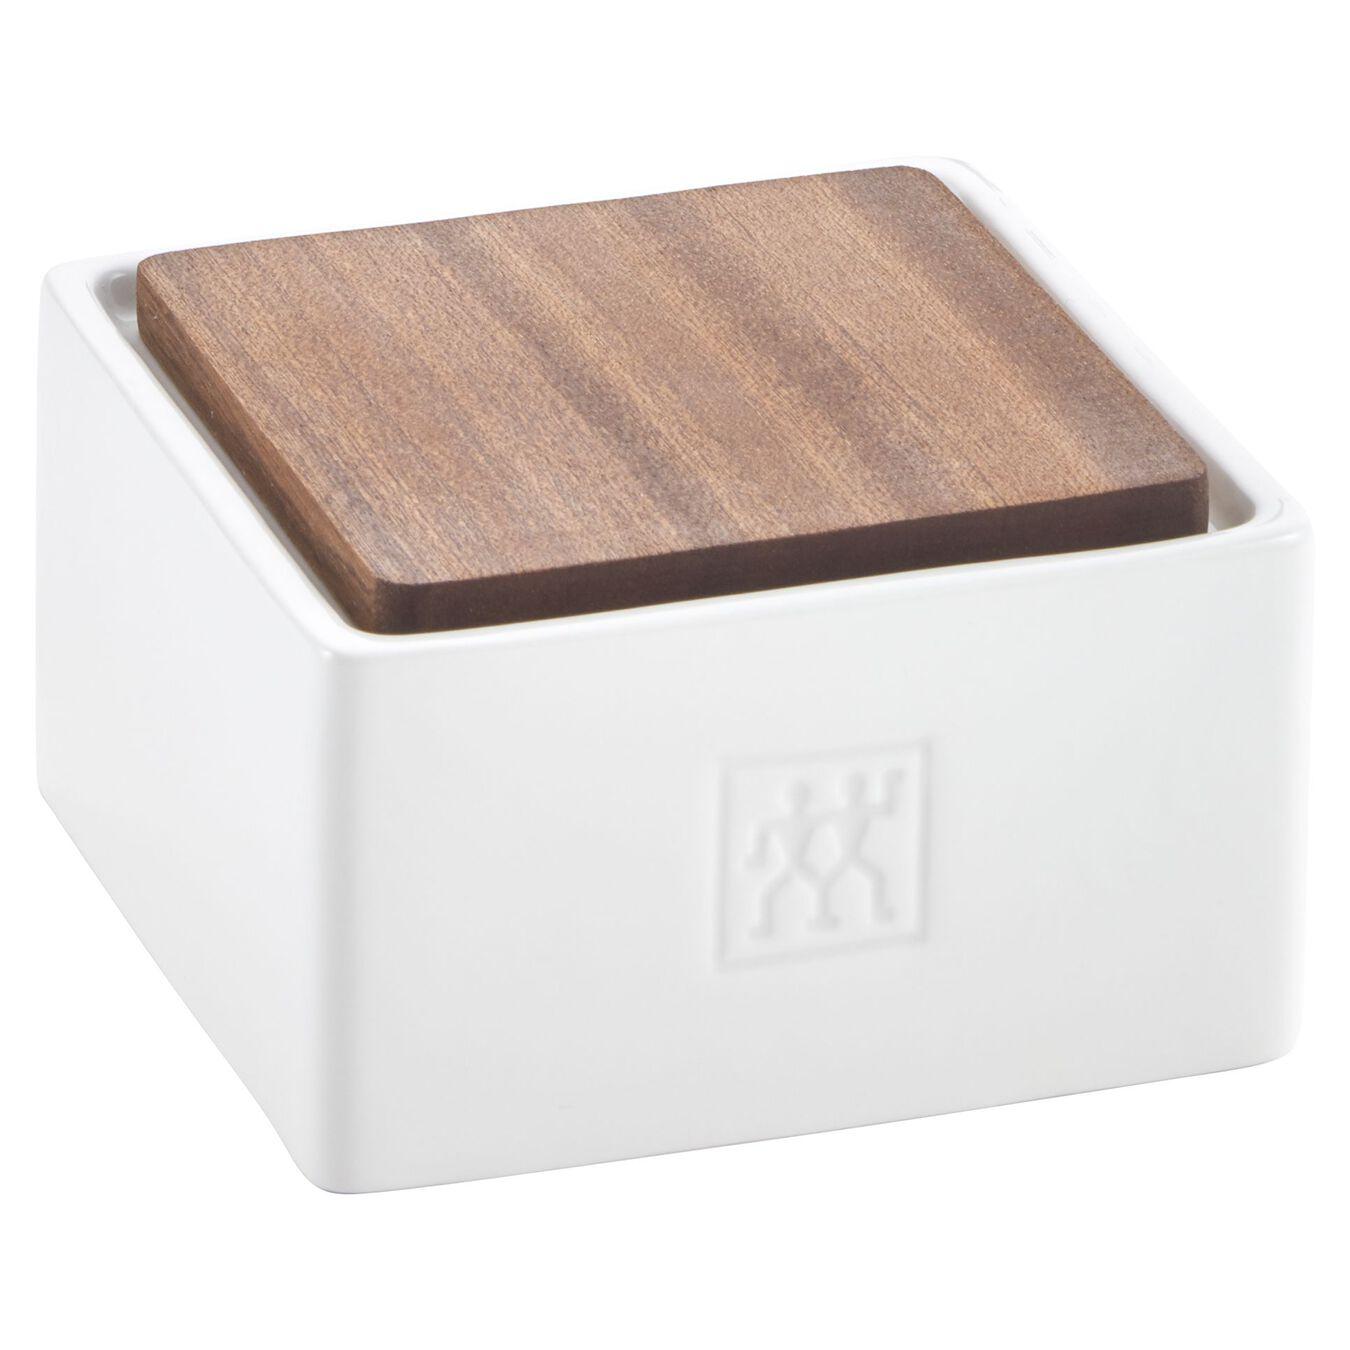 Set ceppo verticale quadrato - 4-pz., ceramica,,large 6